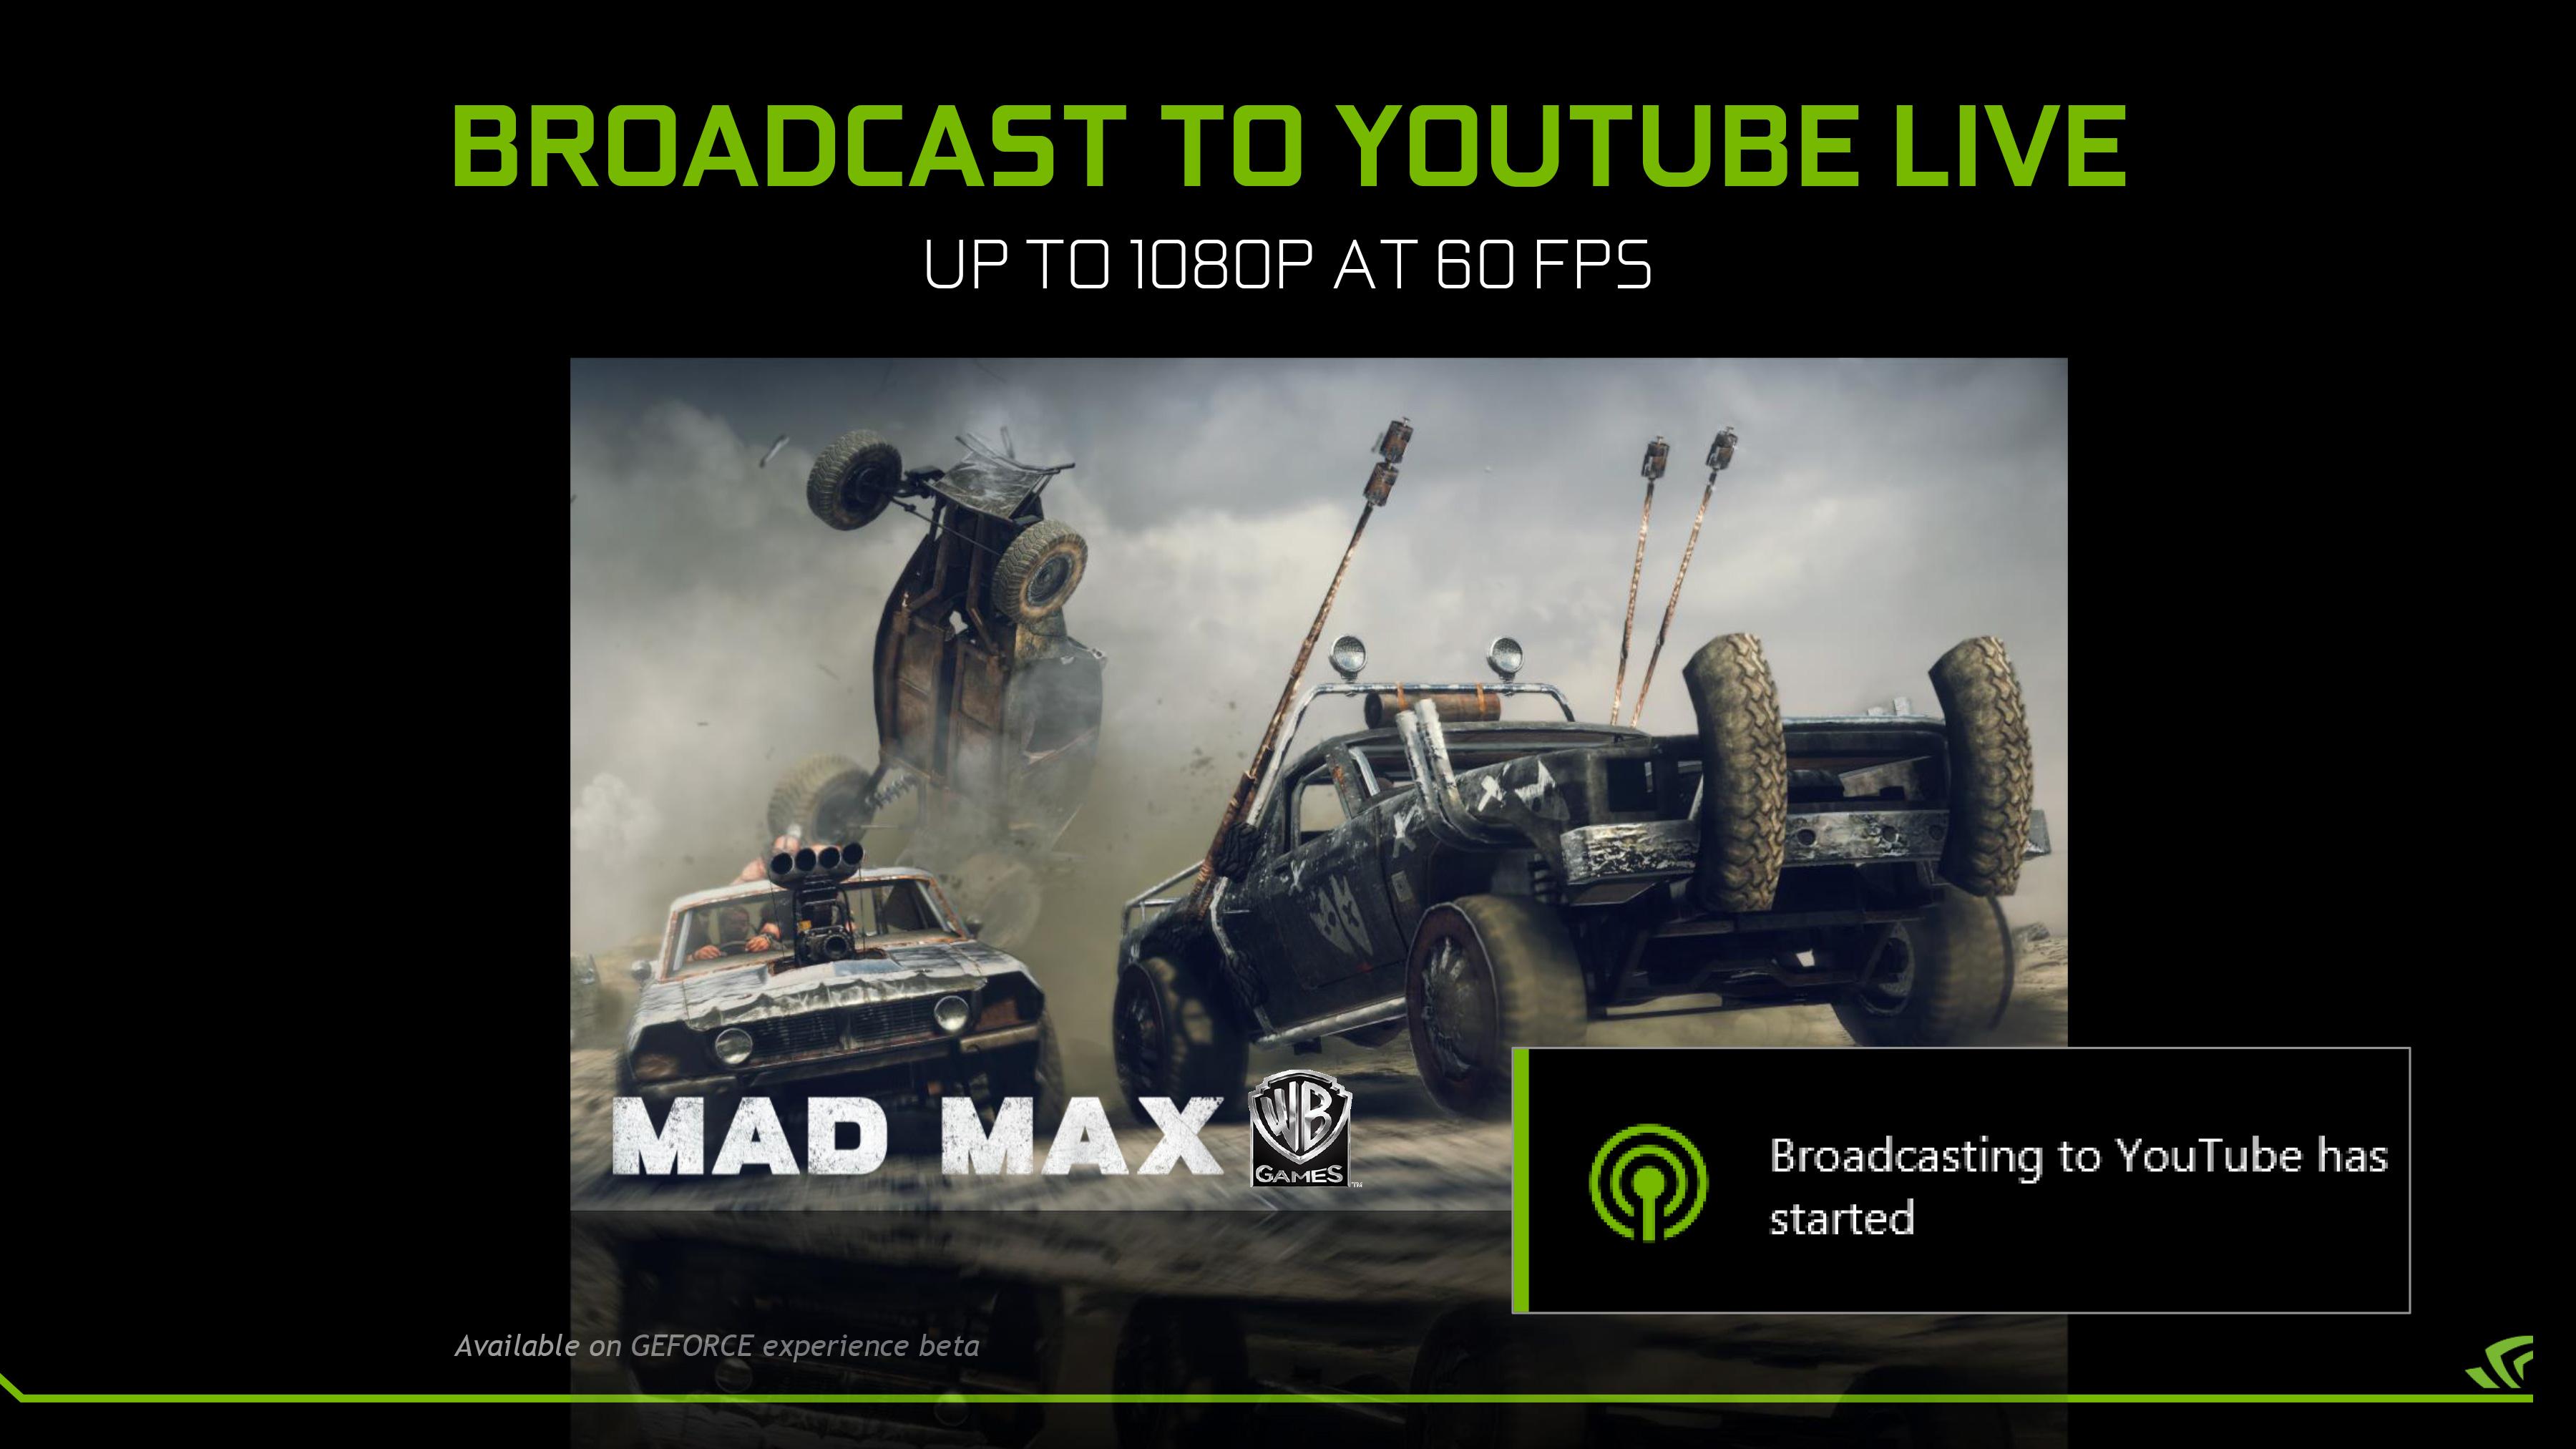 NVIDIA GeForce Experience Update: 4K GameStream & 1080p